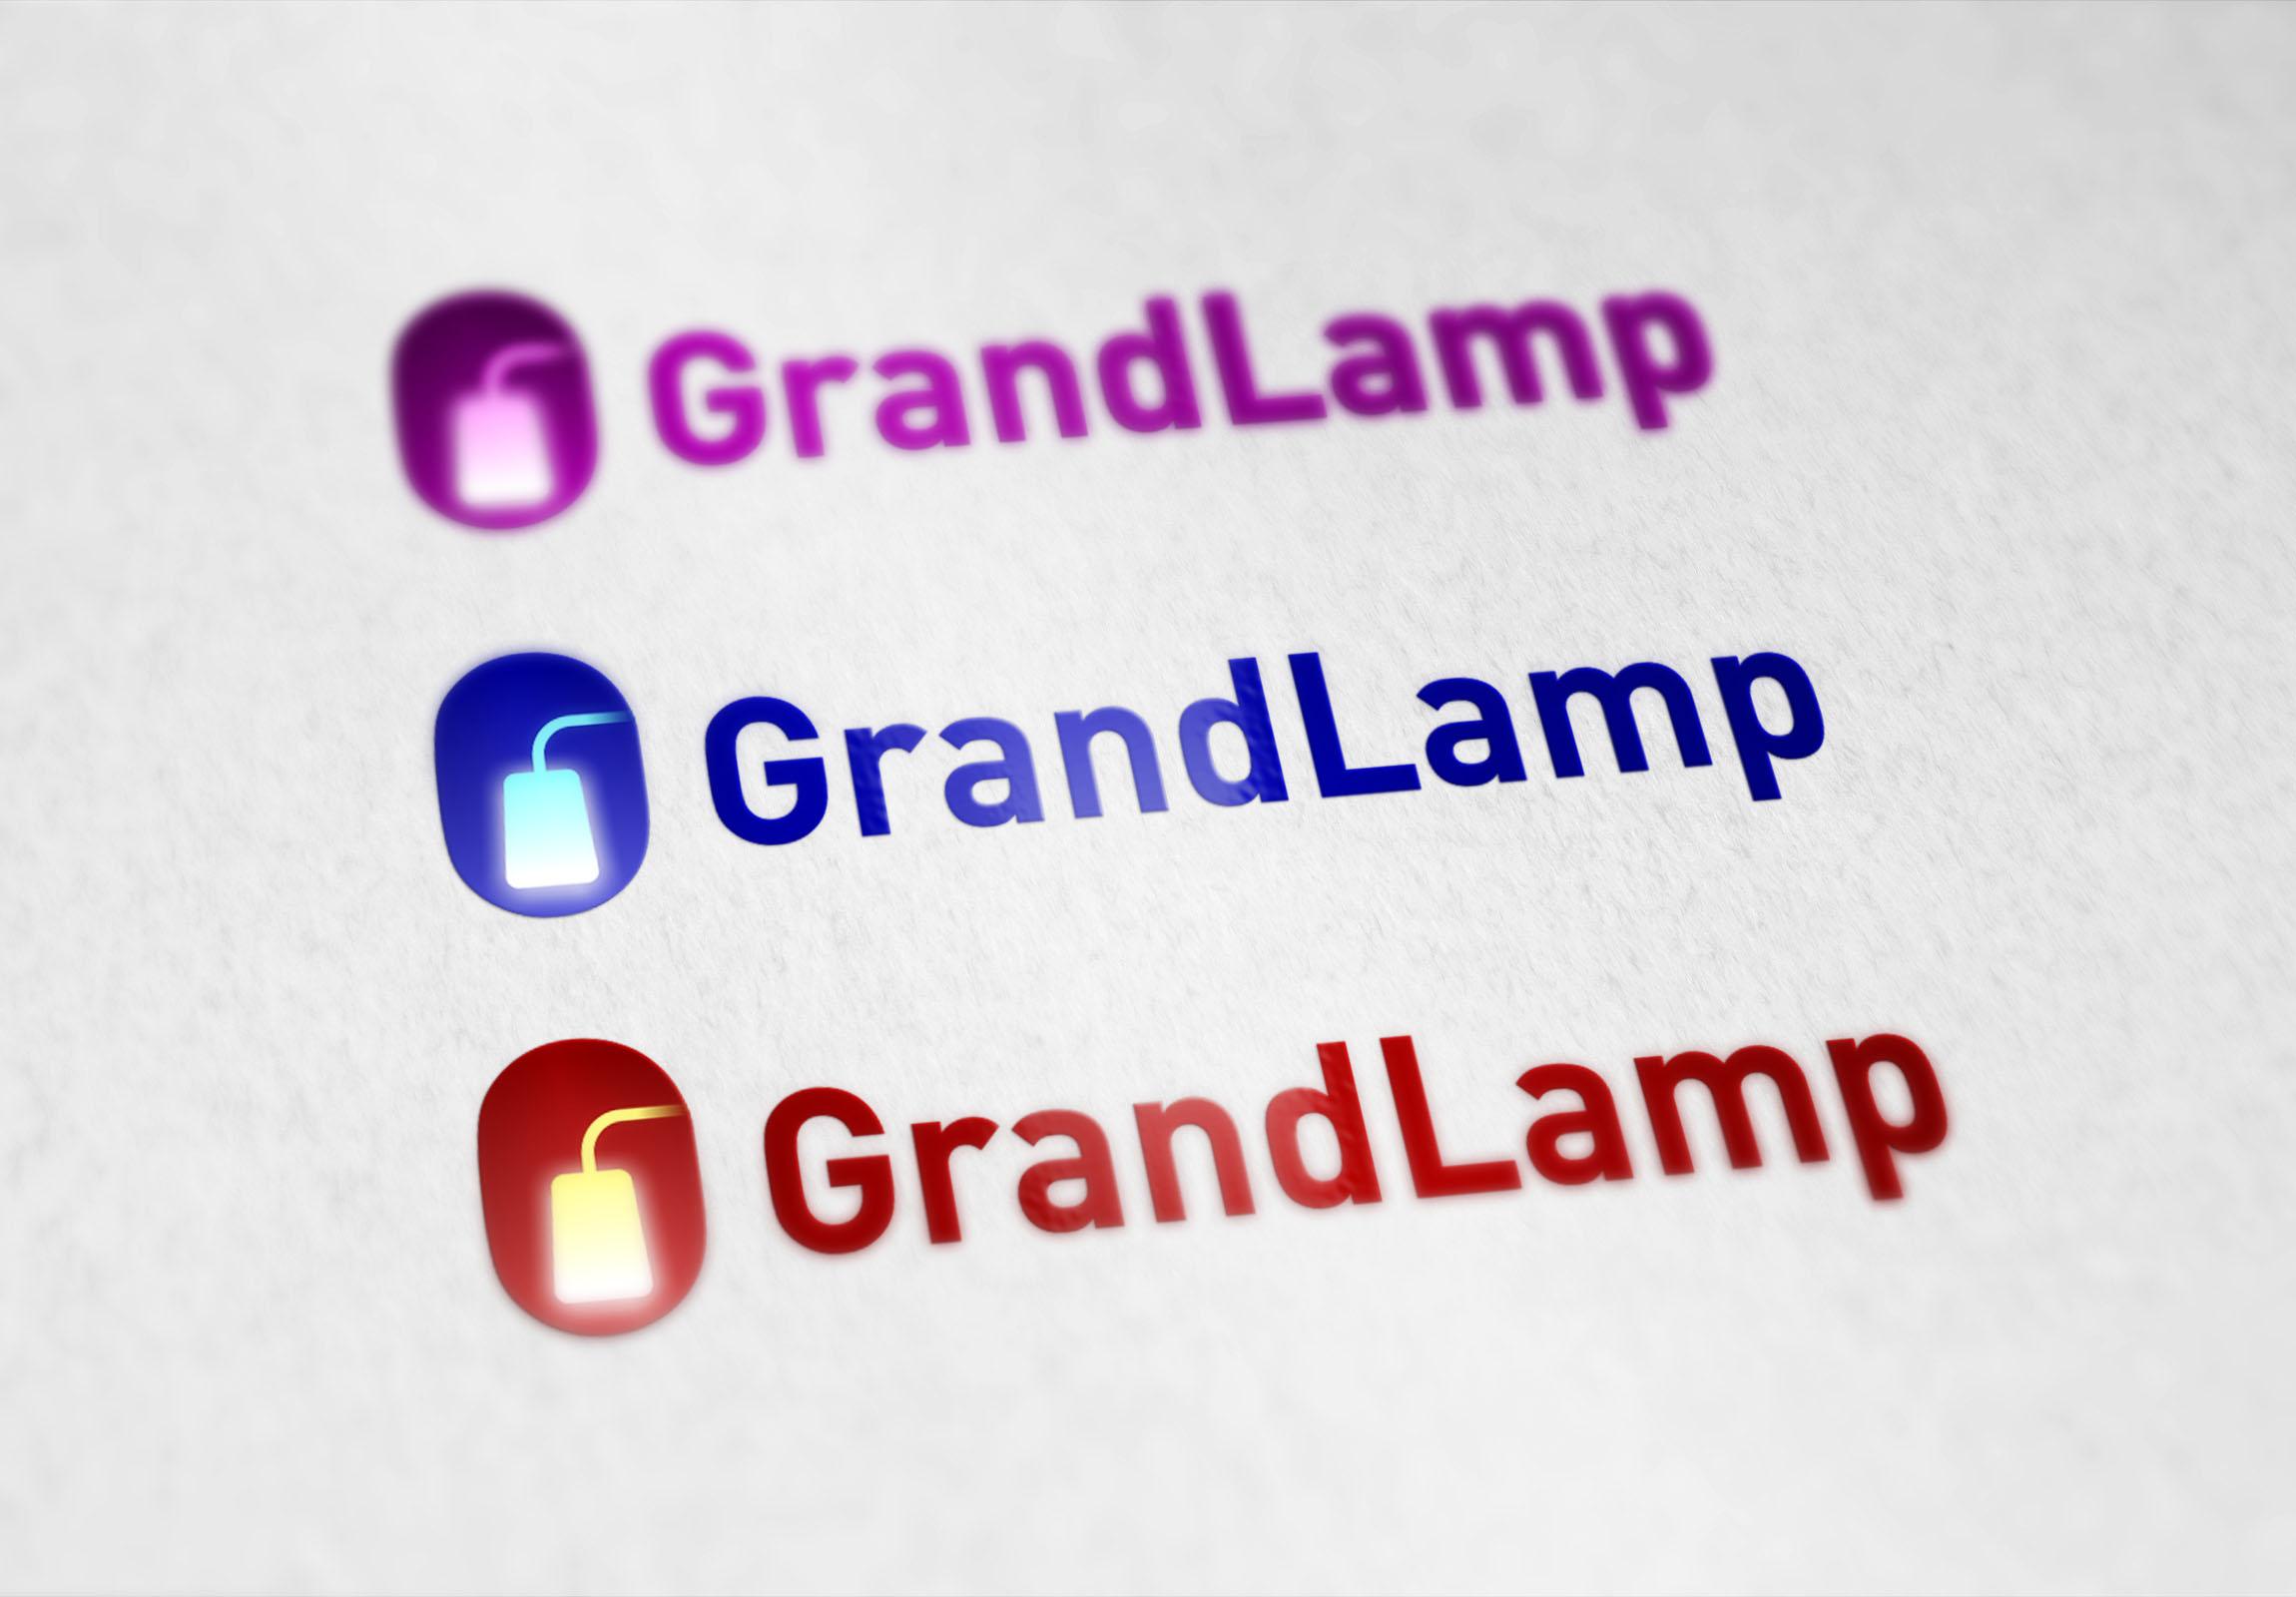 Разработка логотипа и элементов фирменного стиля фото f_91357ead826ba546.jpg